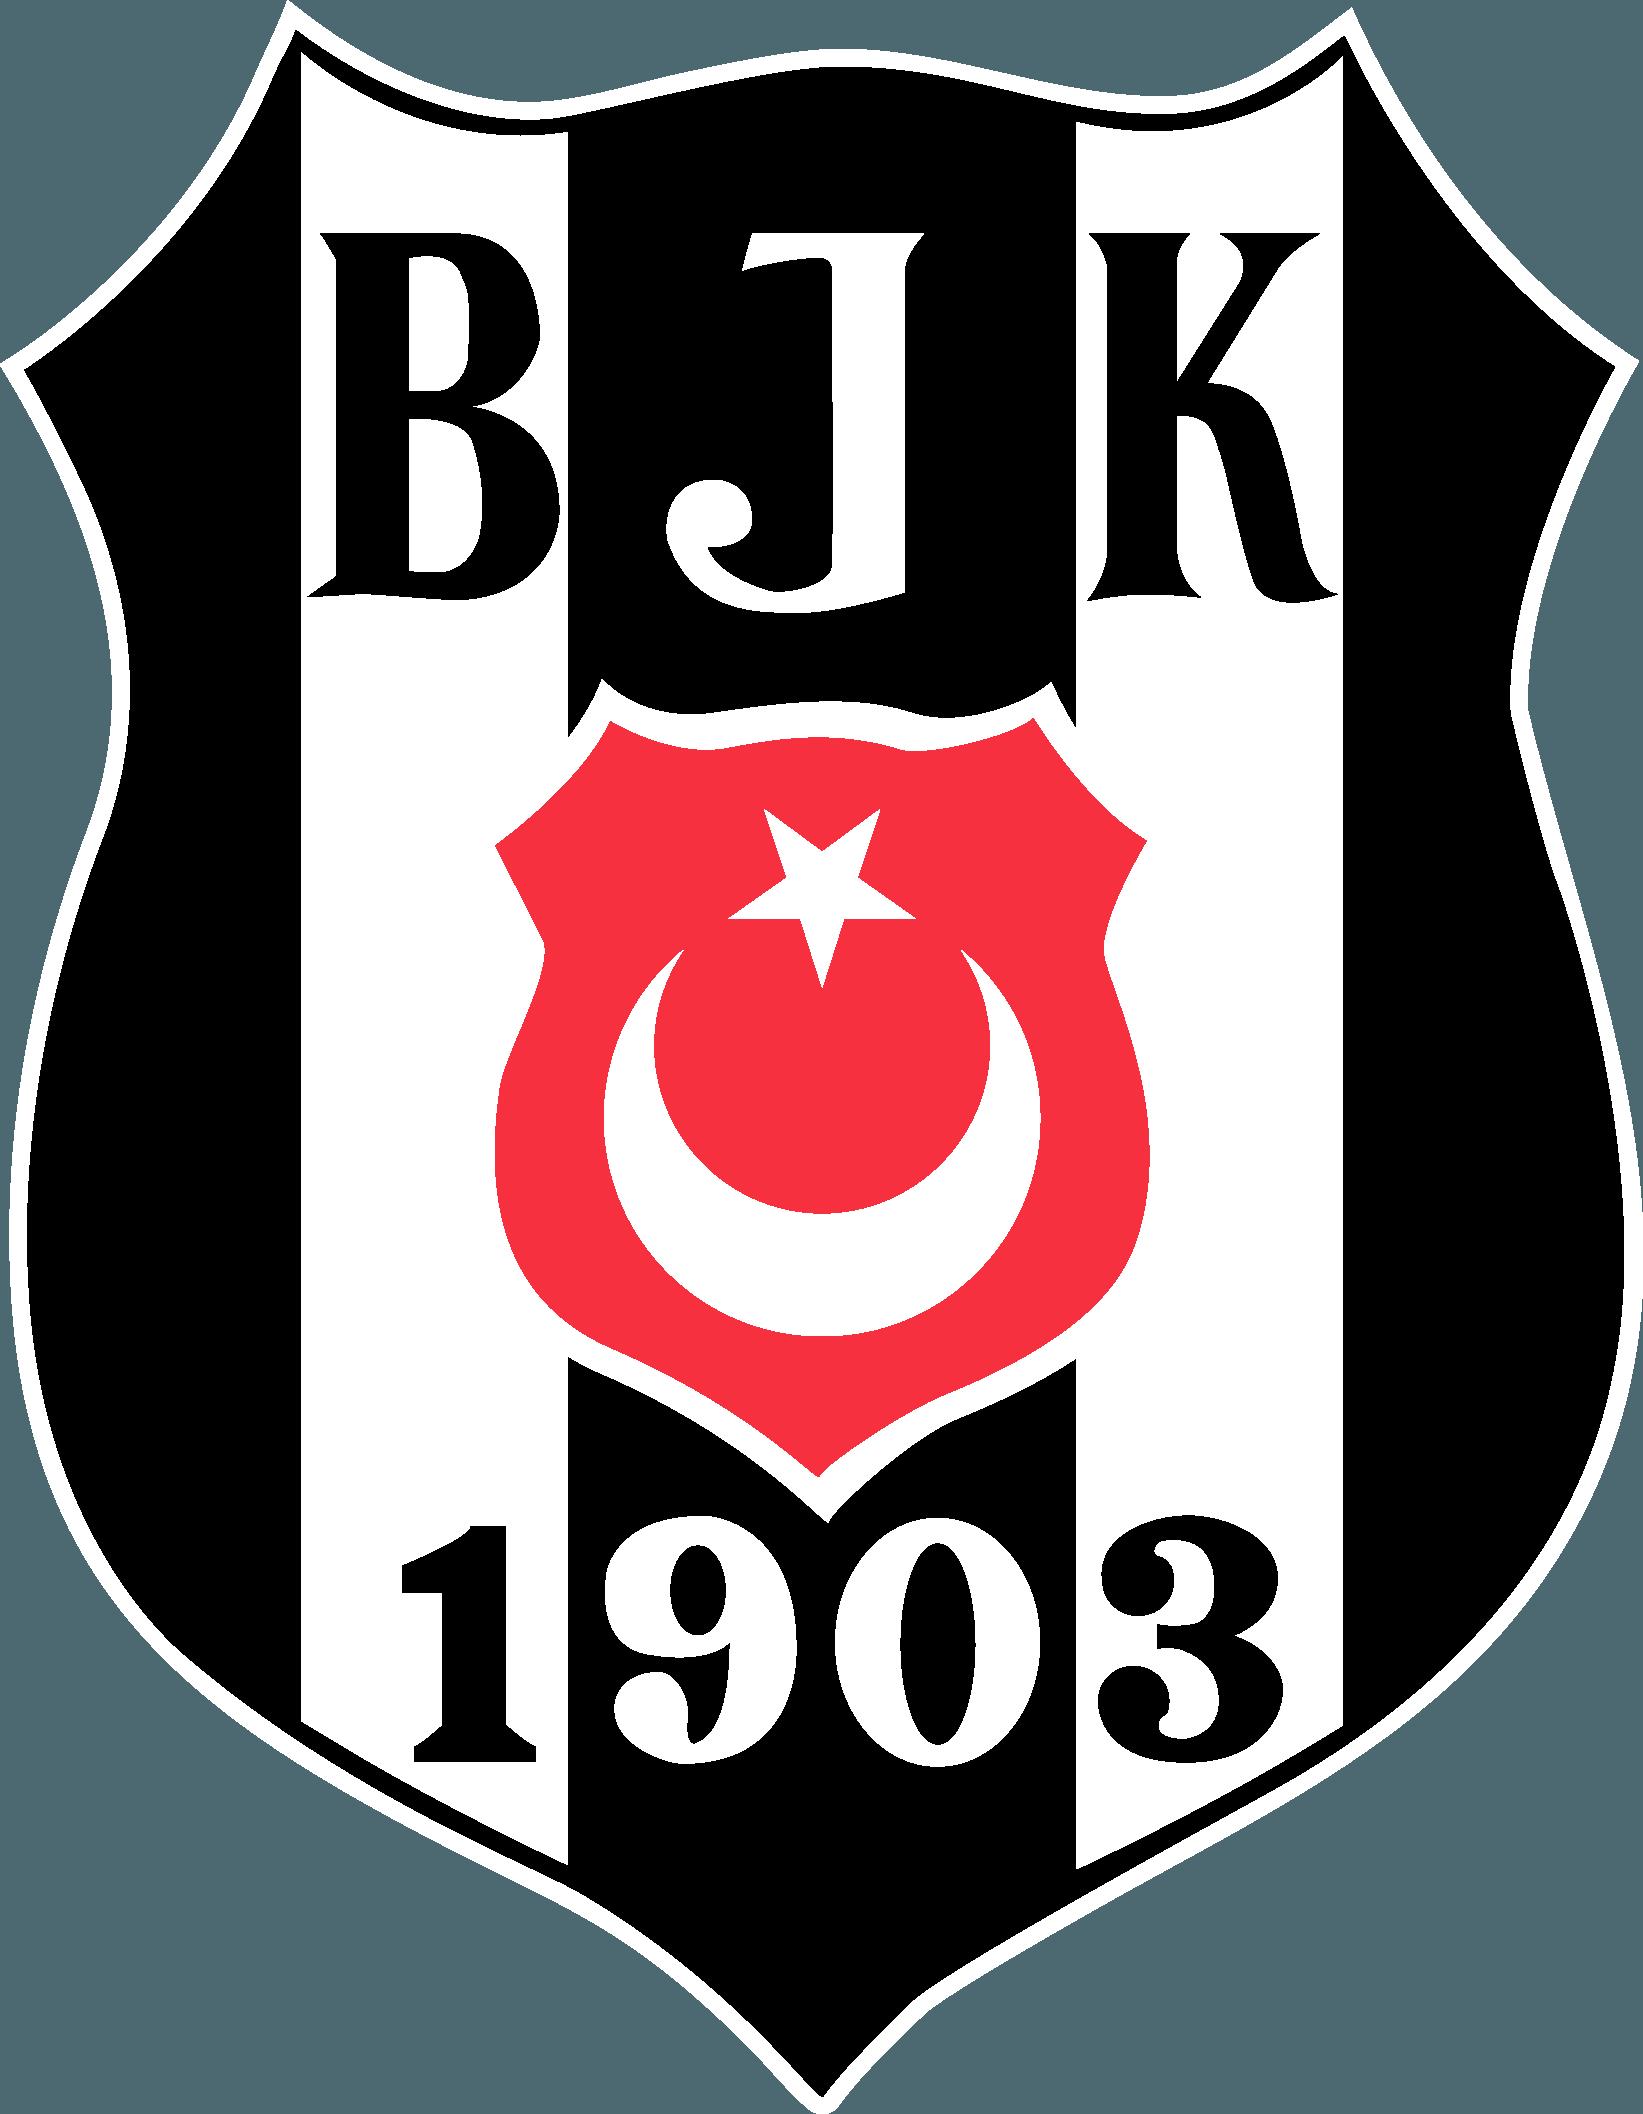 Beşiktaş Spor Kulübü Logo [BJK] png